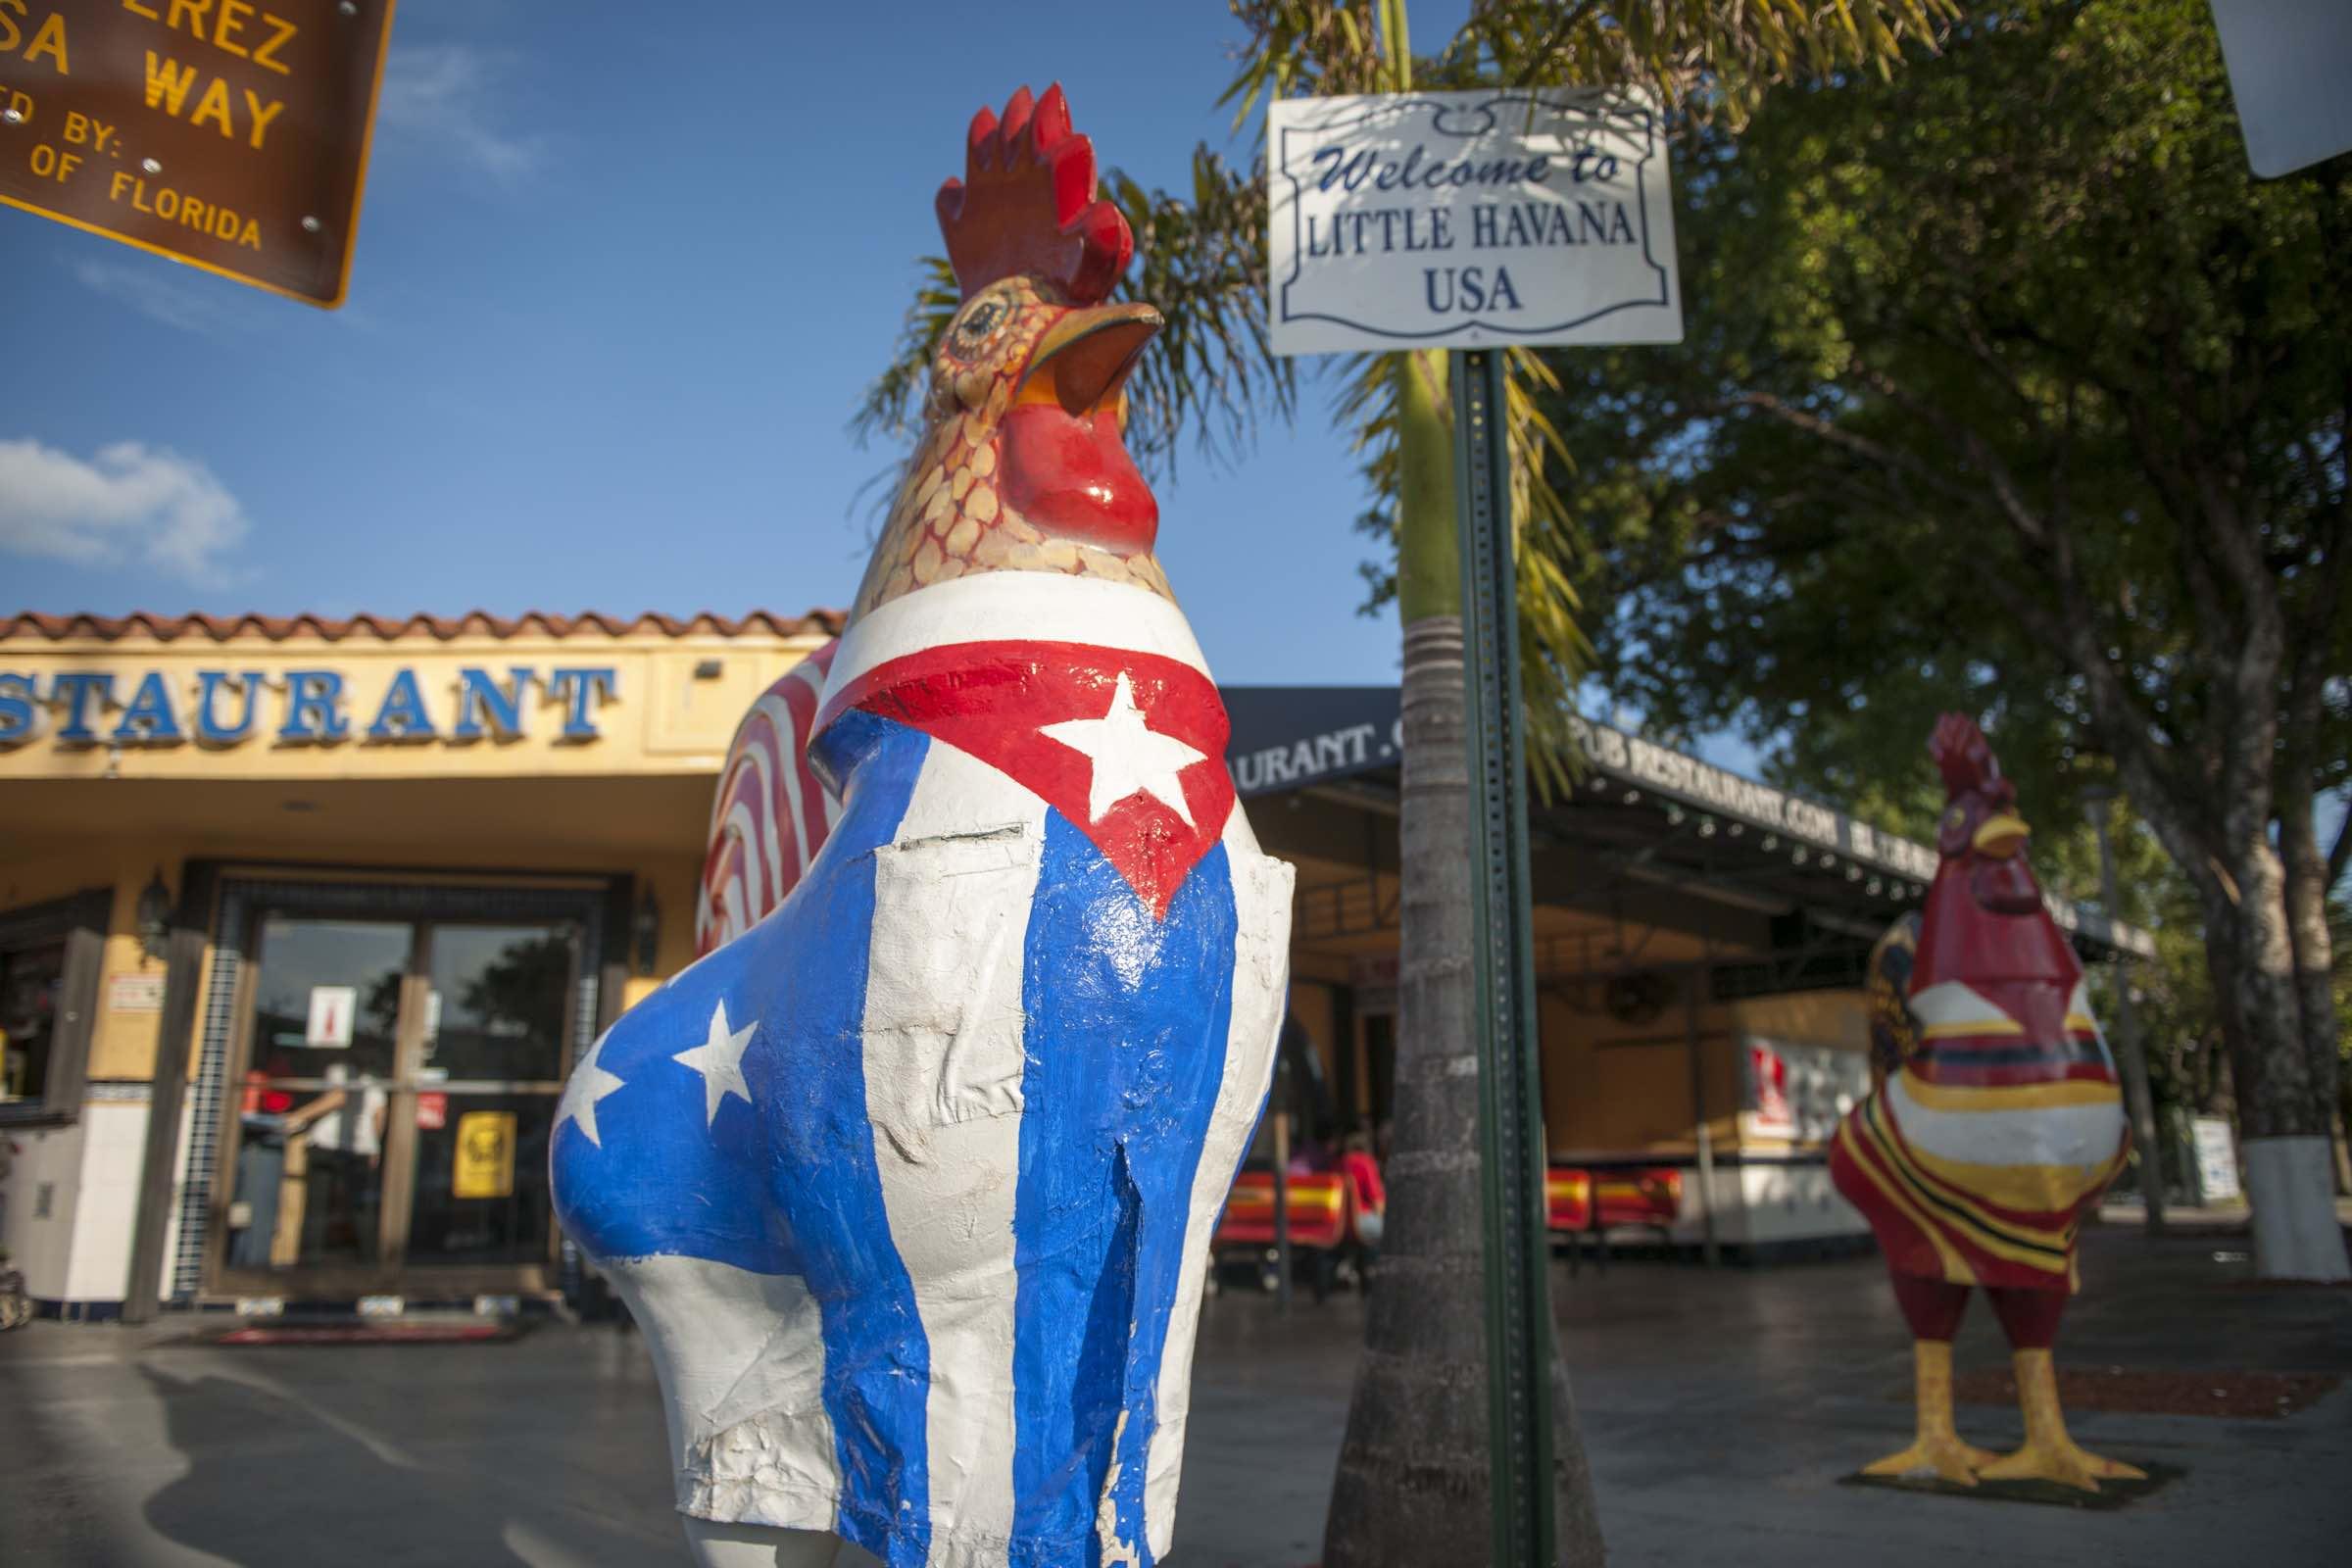 Little Havana Roaster Sculptures. // © 2015 Greater Miami Convention & Visitors Bureau